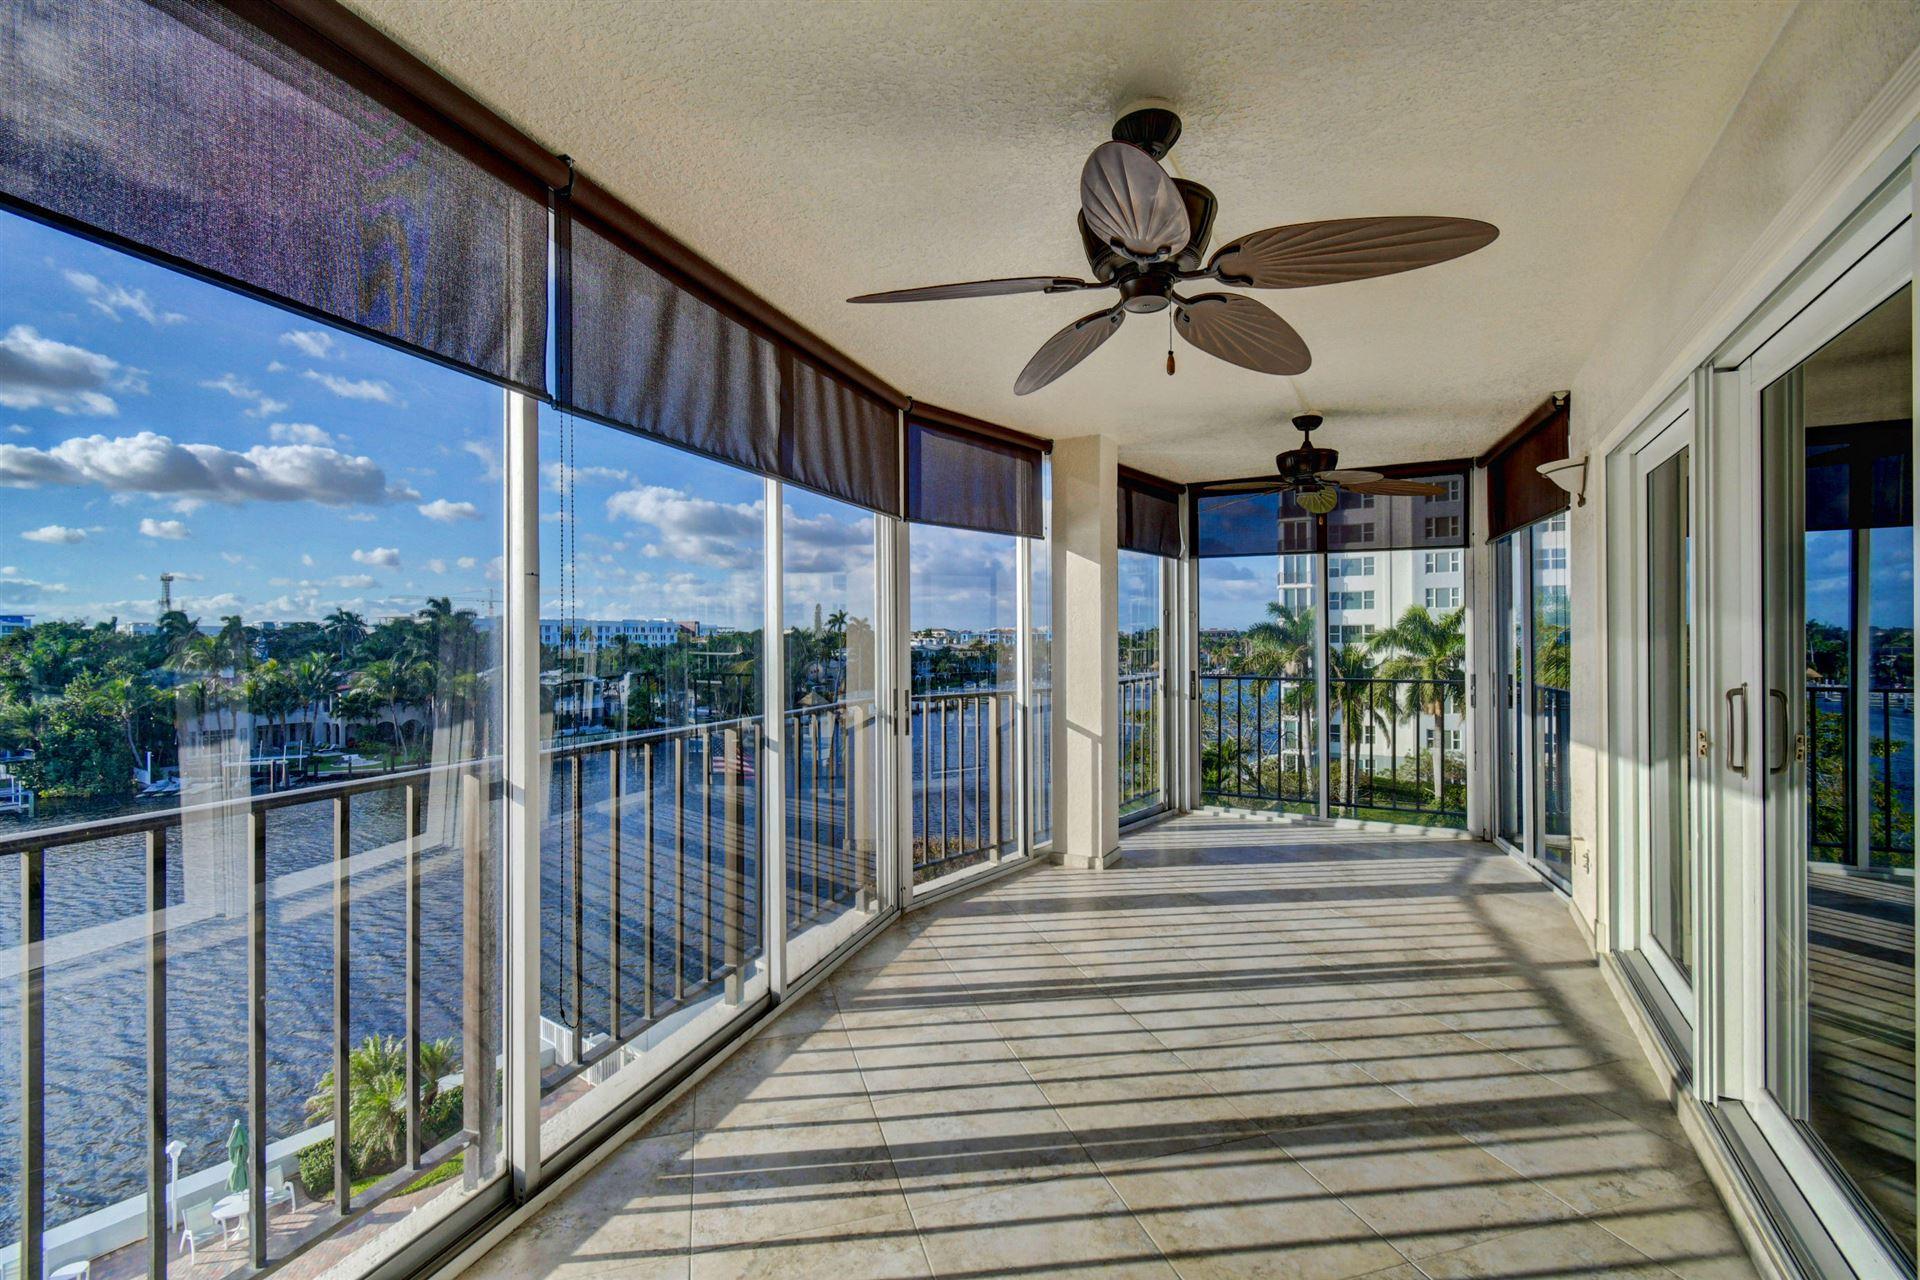 Photo of 220 Macfarlane Drive #S-502, Delray Beach, FL 33483 (MLS # RX-10675525)